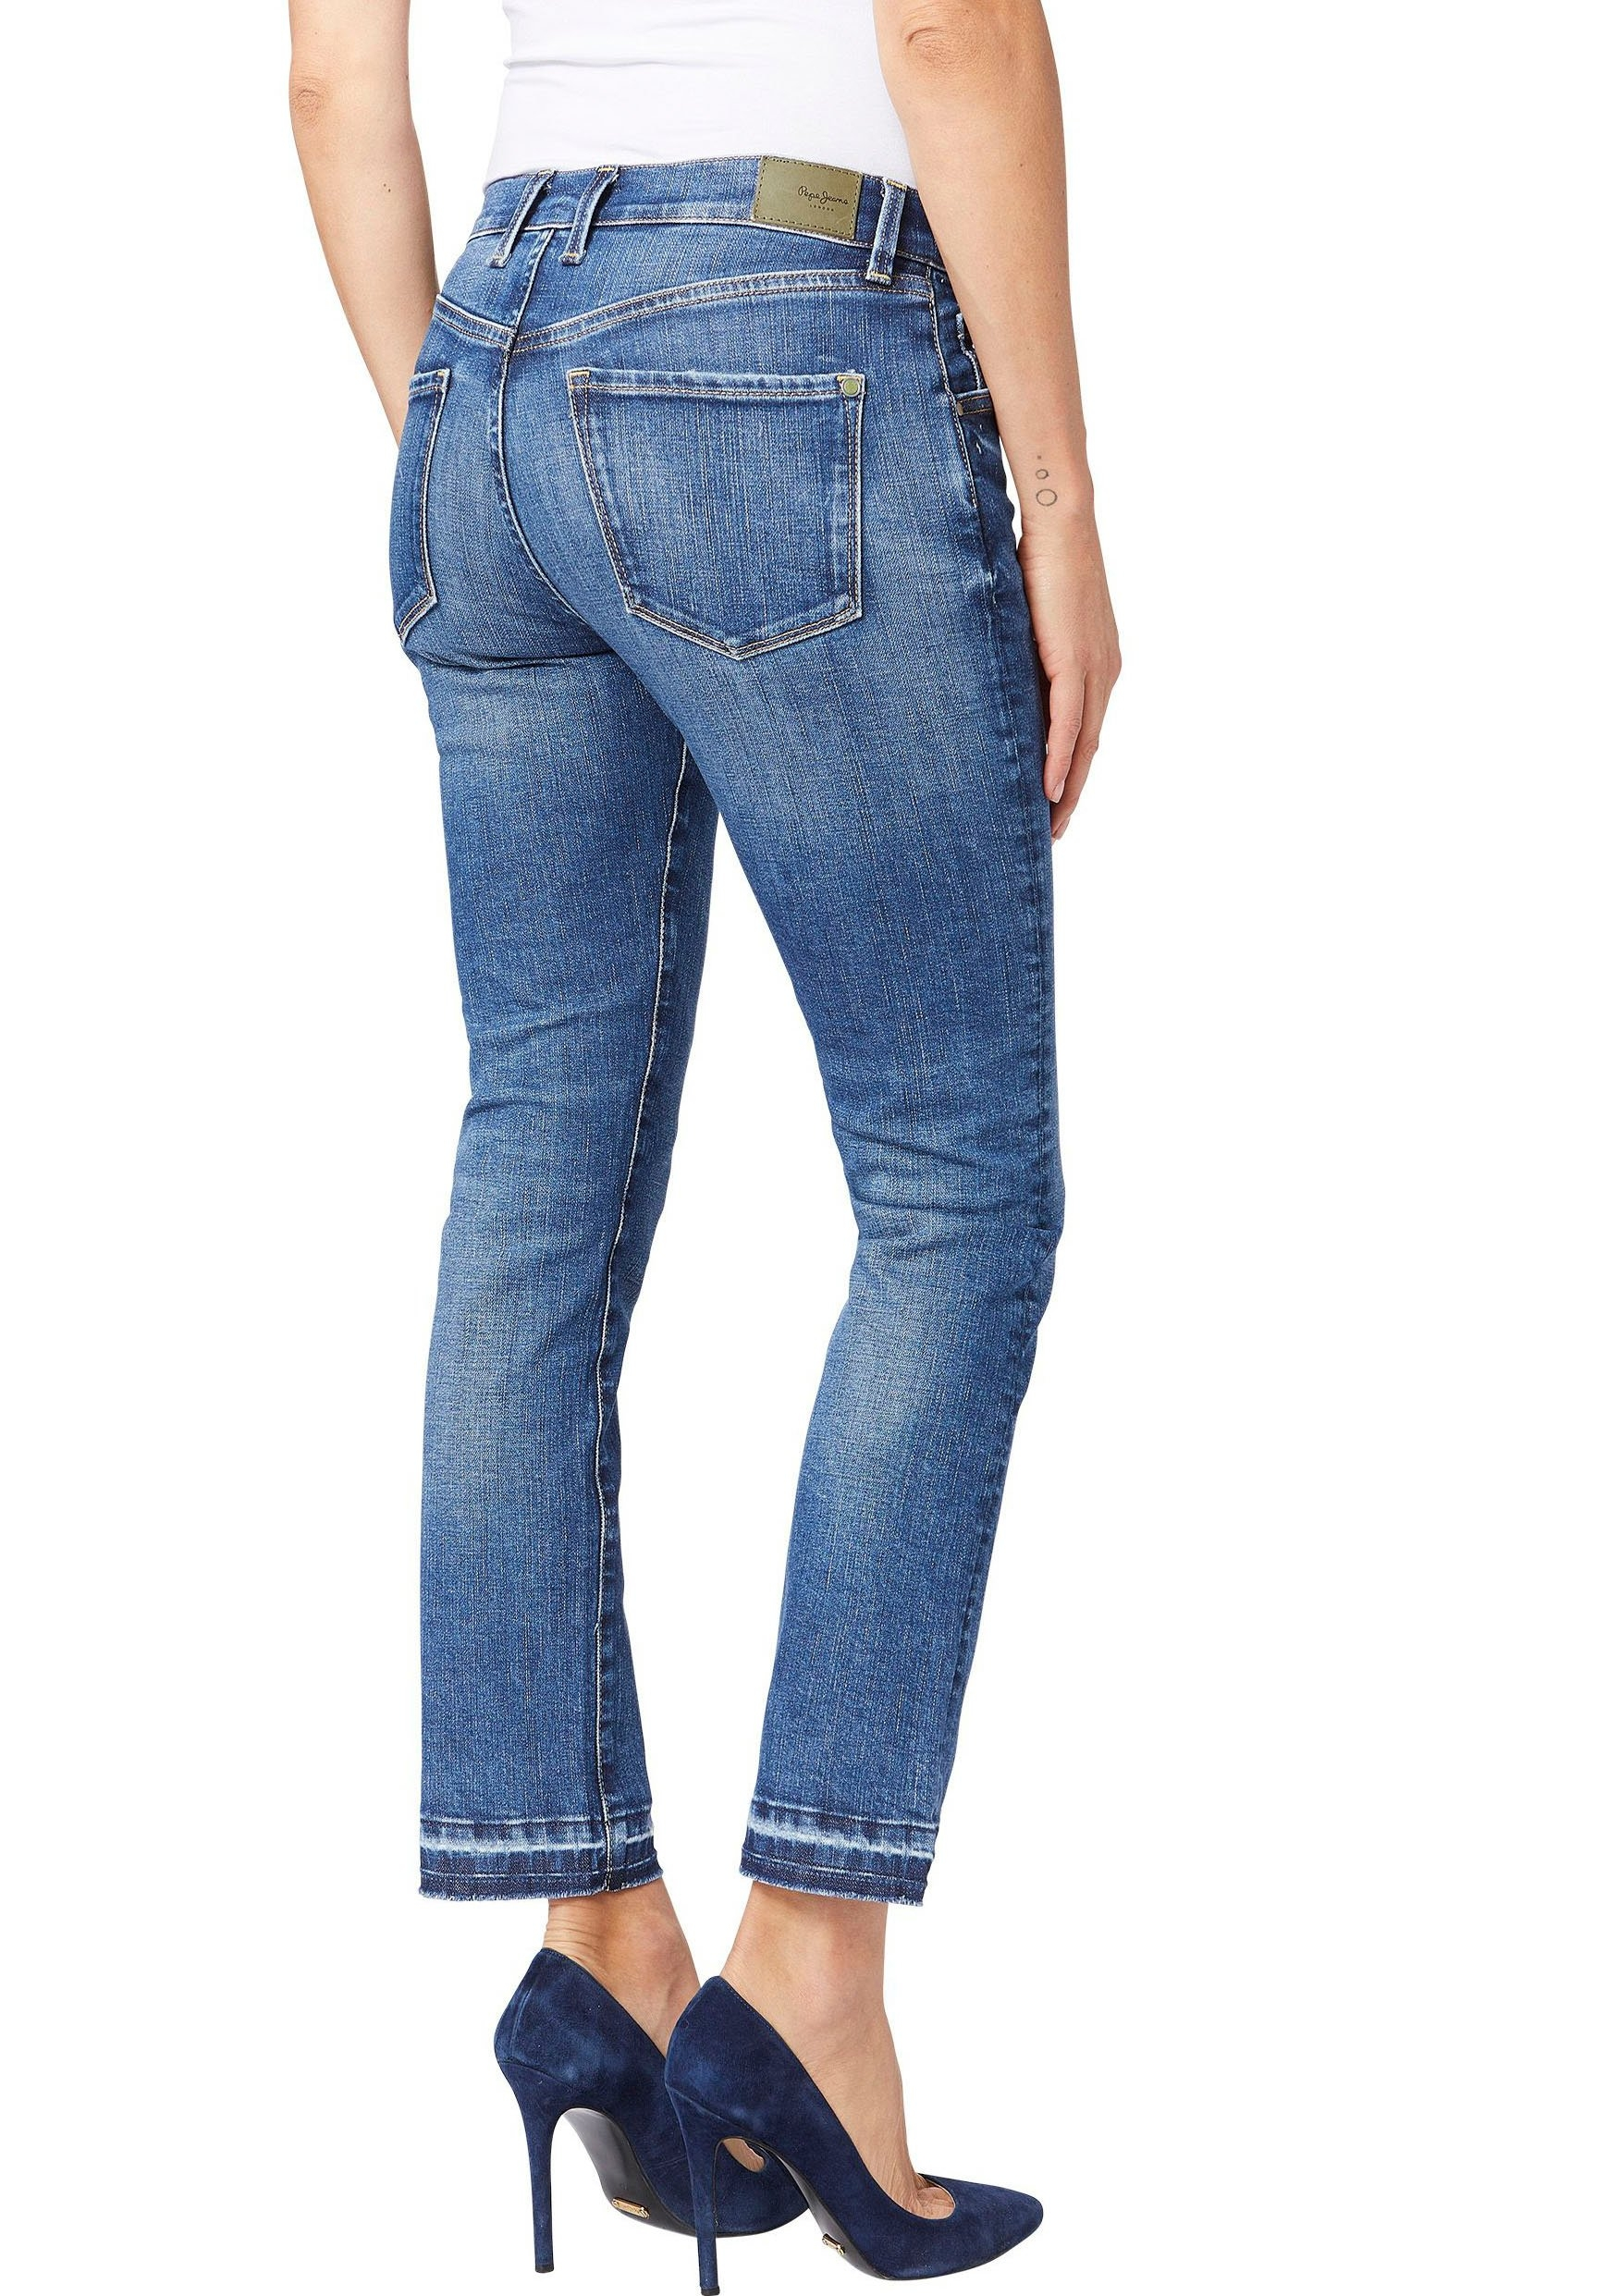 Pepe Jeans slim fit jeans VICTORIA in mom-carrot-fit met stretch-aandeel online kopen op otto.nl